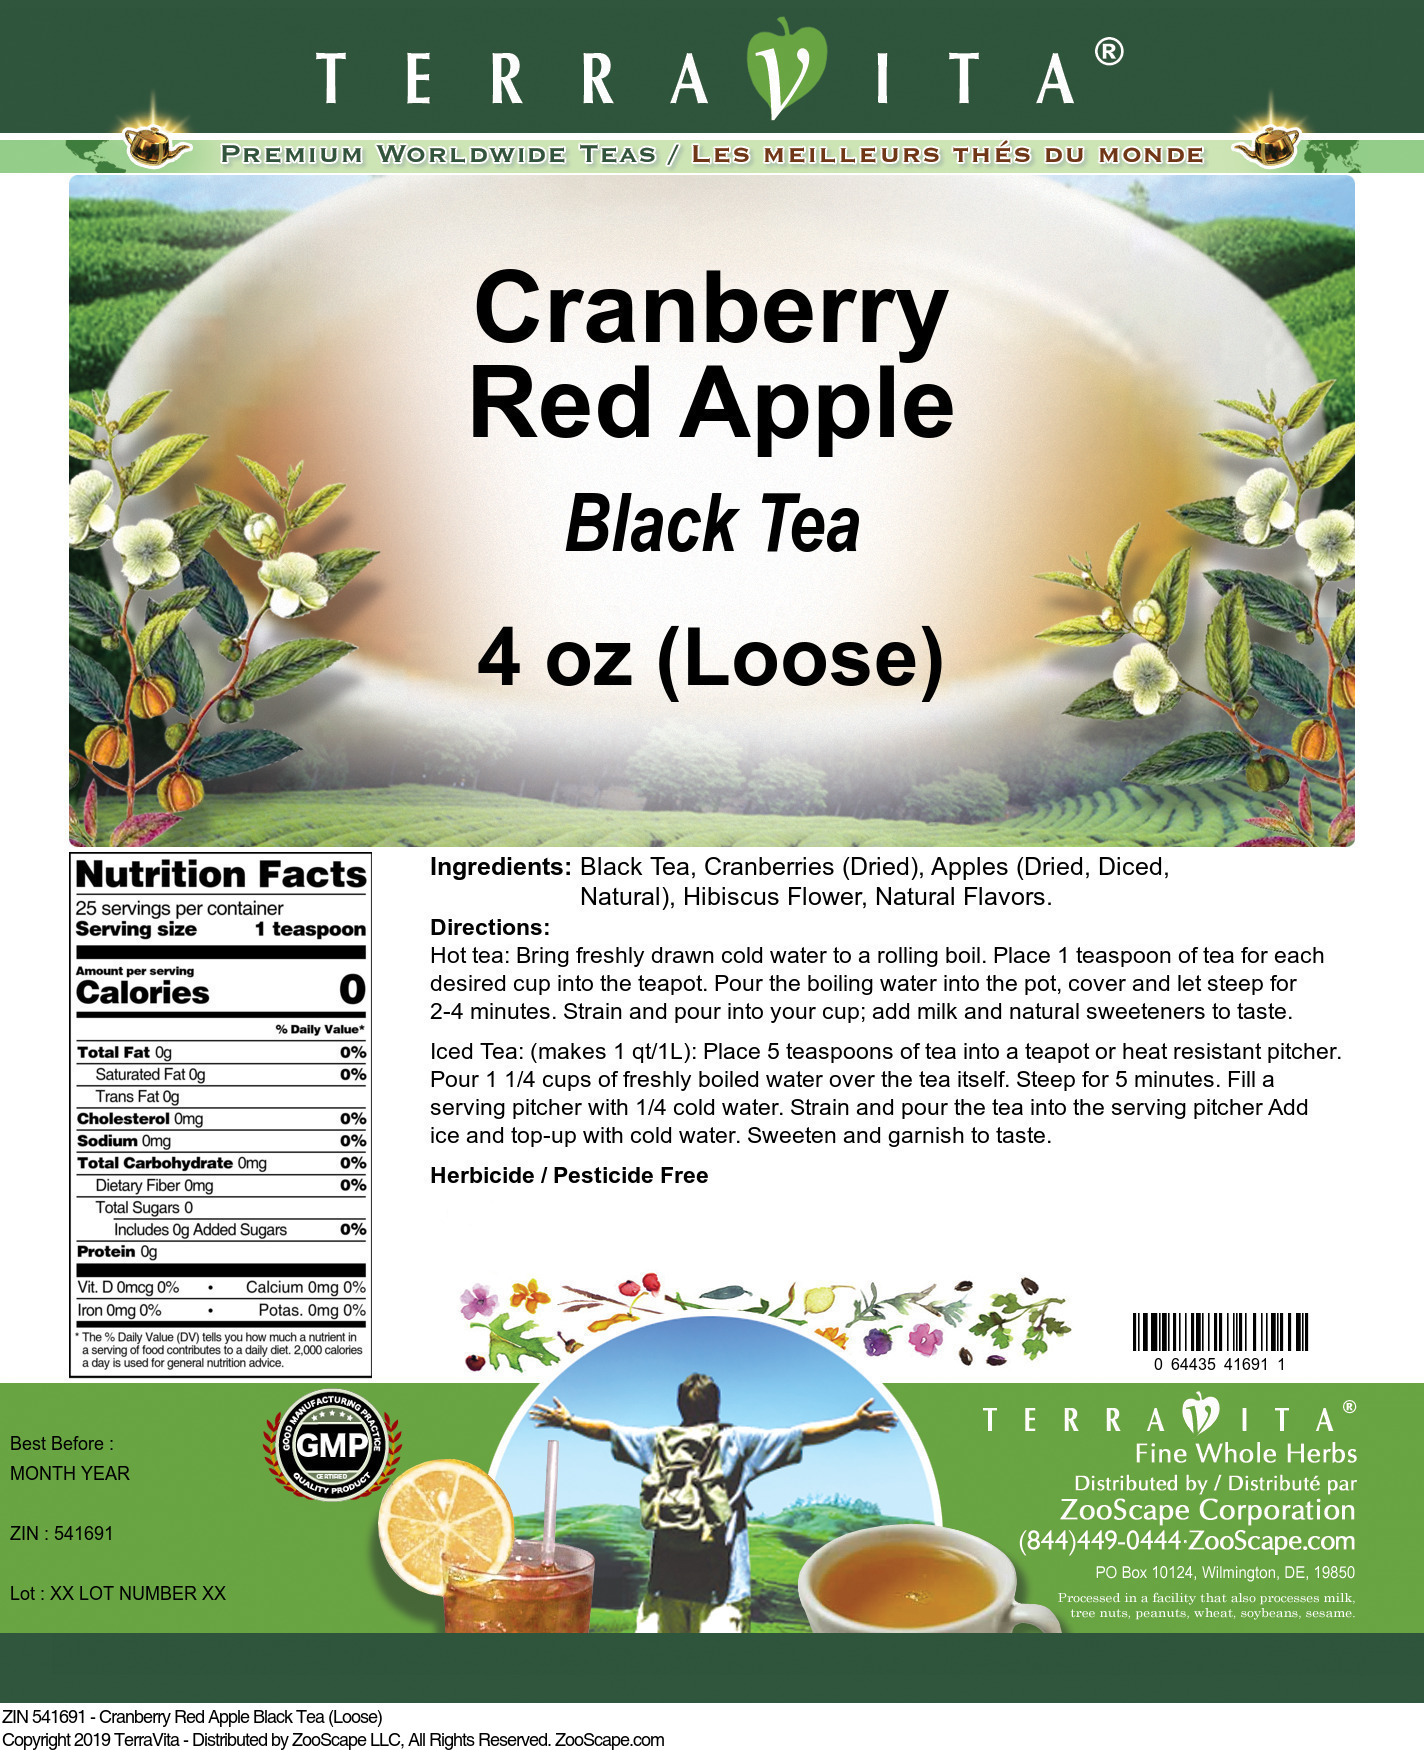 Cranberry Red Apple Black Tea